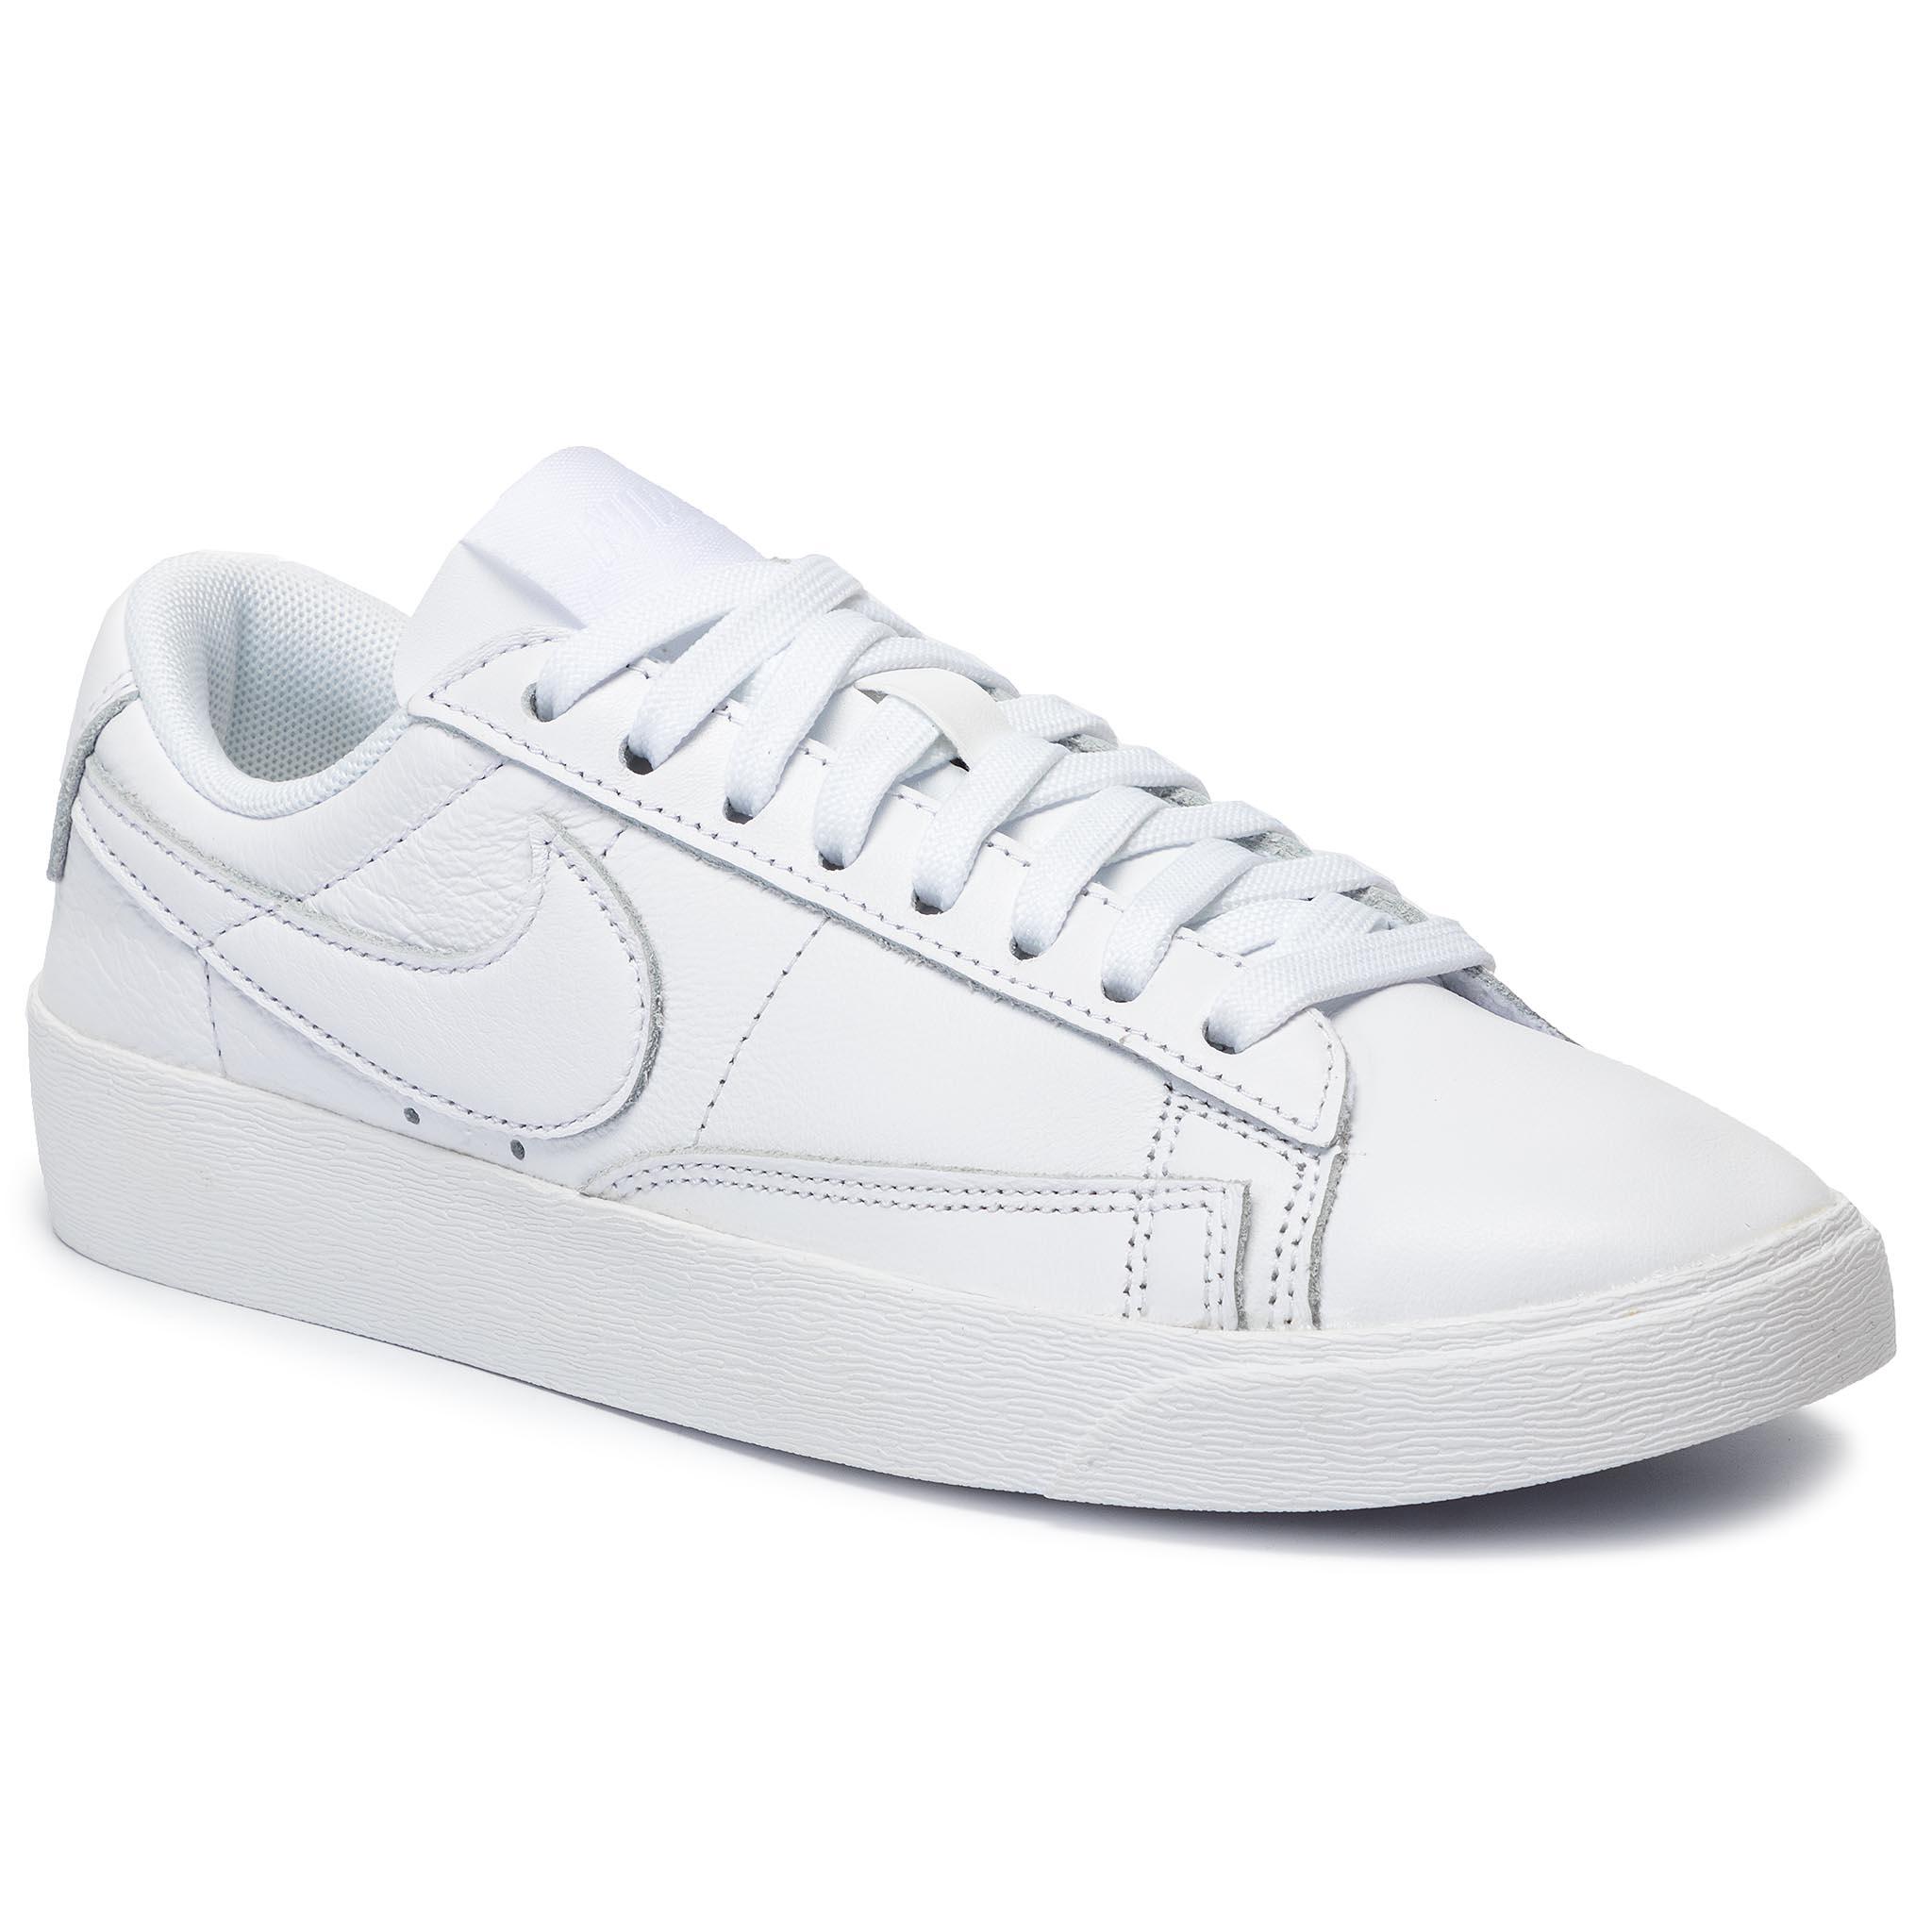 watch 8178d b029c Shoes NIKE - Blazer Low Le AV9370 102 White/Laser Fuchsia ...